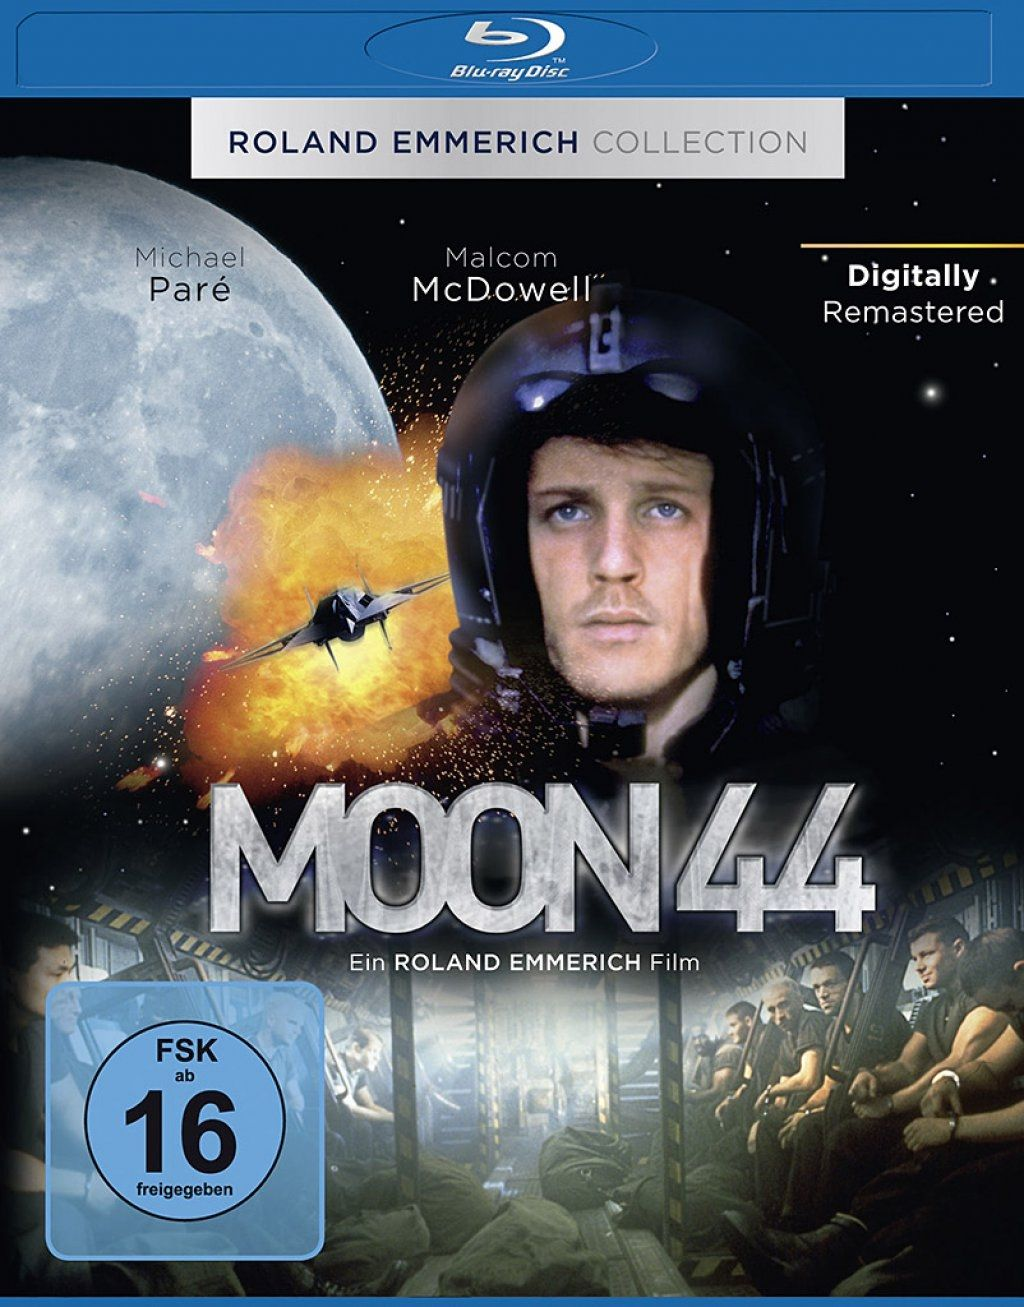 Moon 44 (Roland Emmerich Collection) (BLURAY)